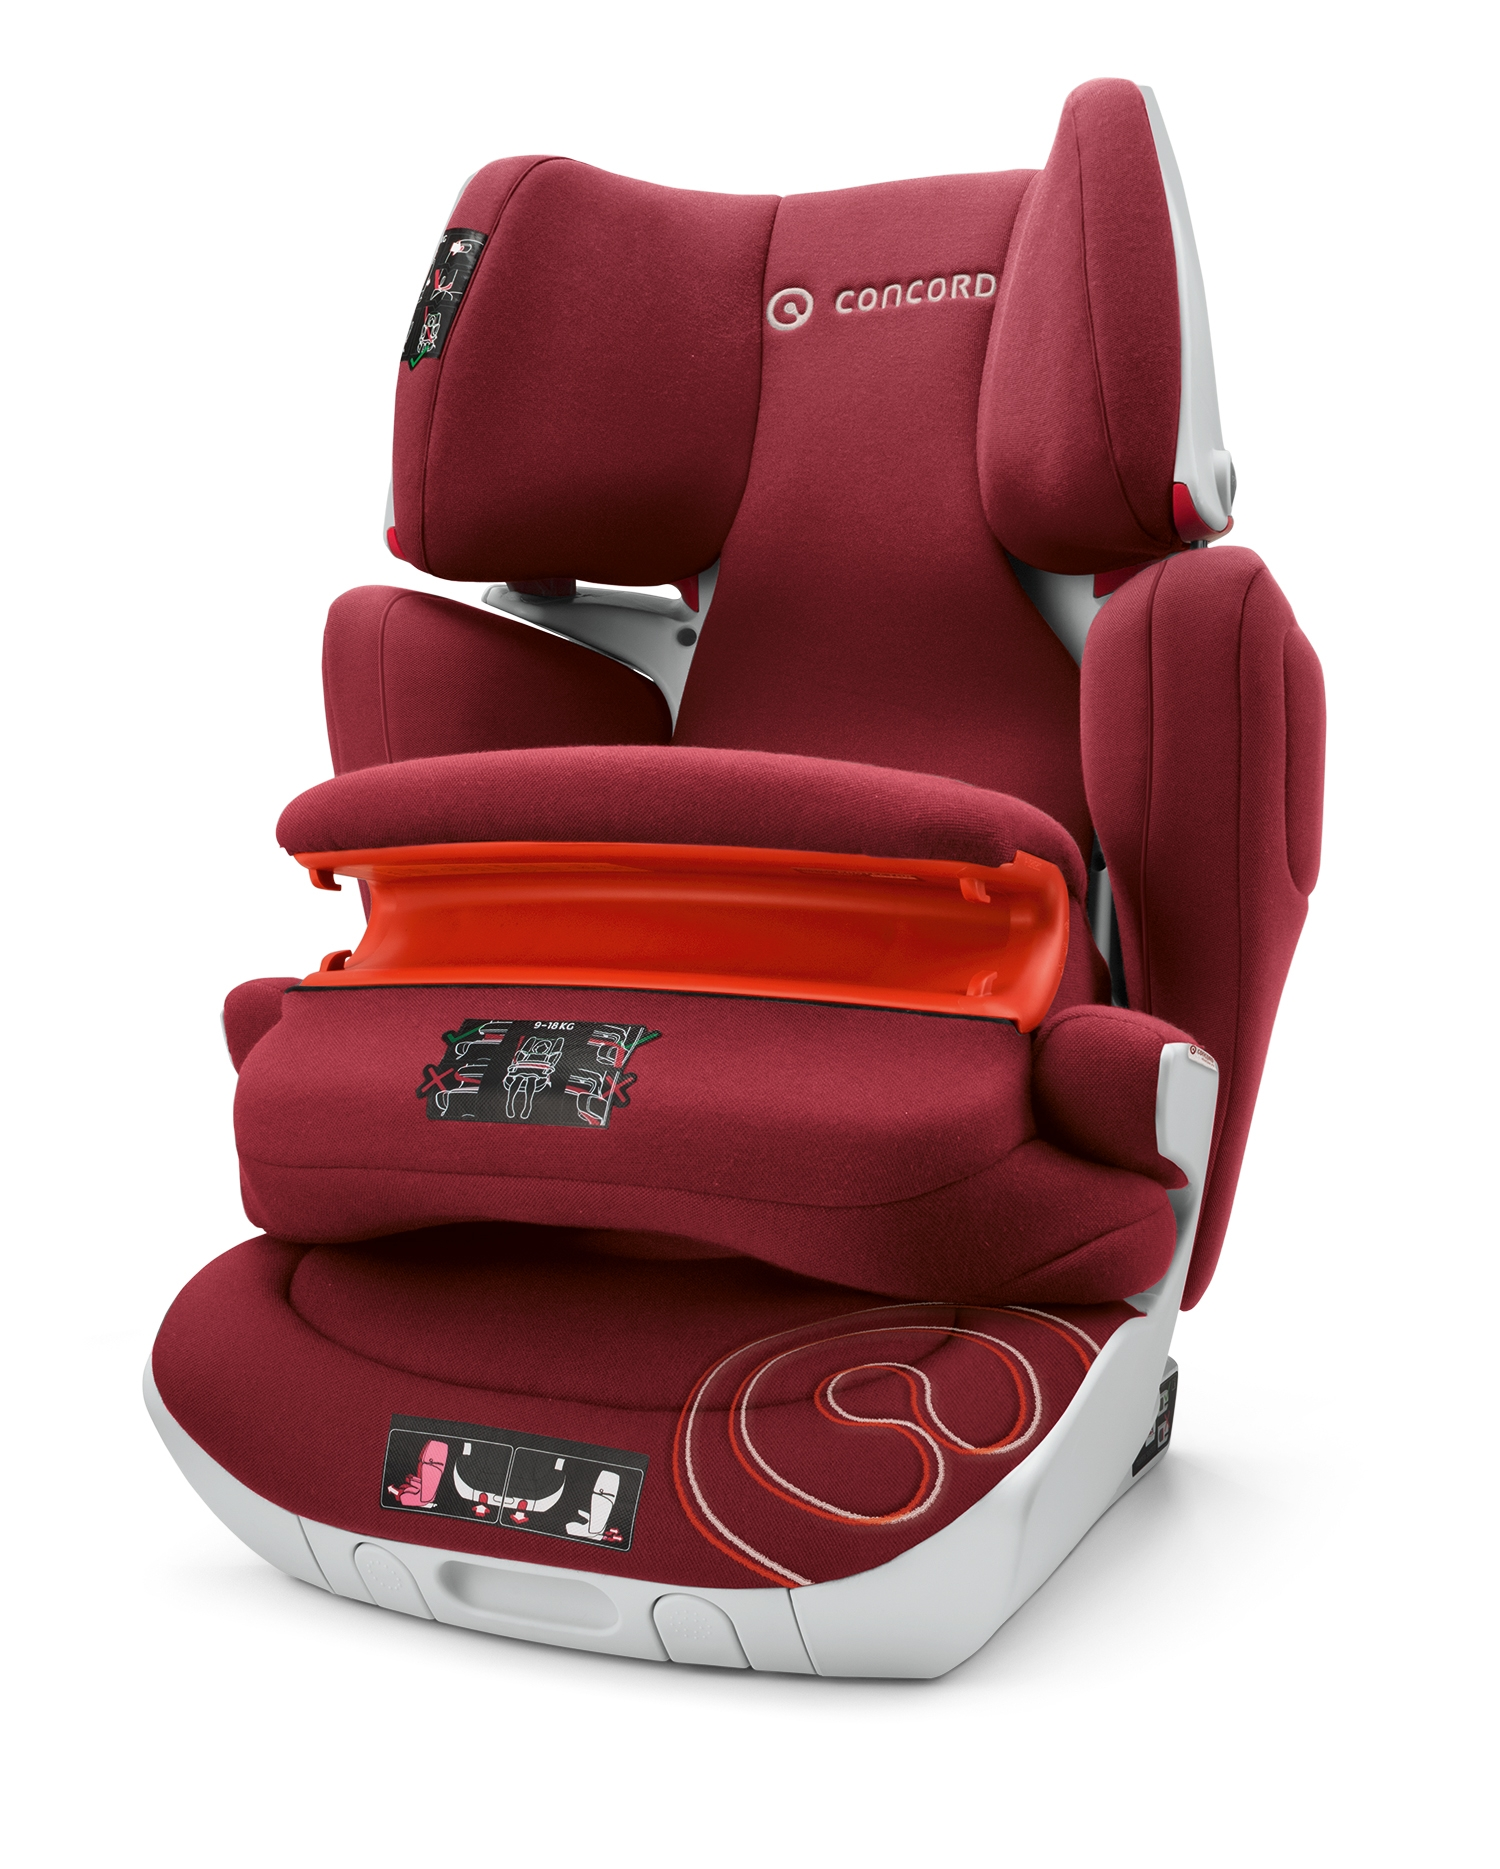 concord child car seat transformer xt pro buy at kidsroom car seats isofix child car seats. Black Bedroom Furniture Sets. Home Design Ideas